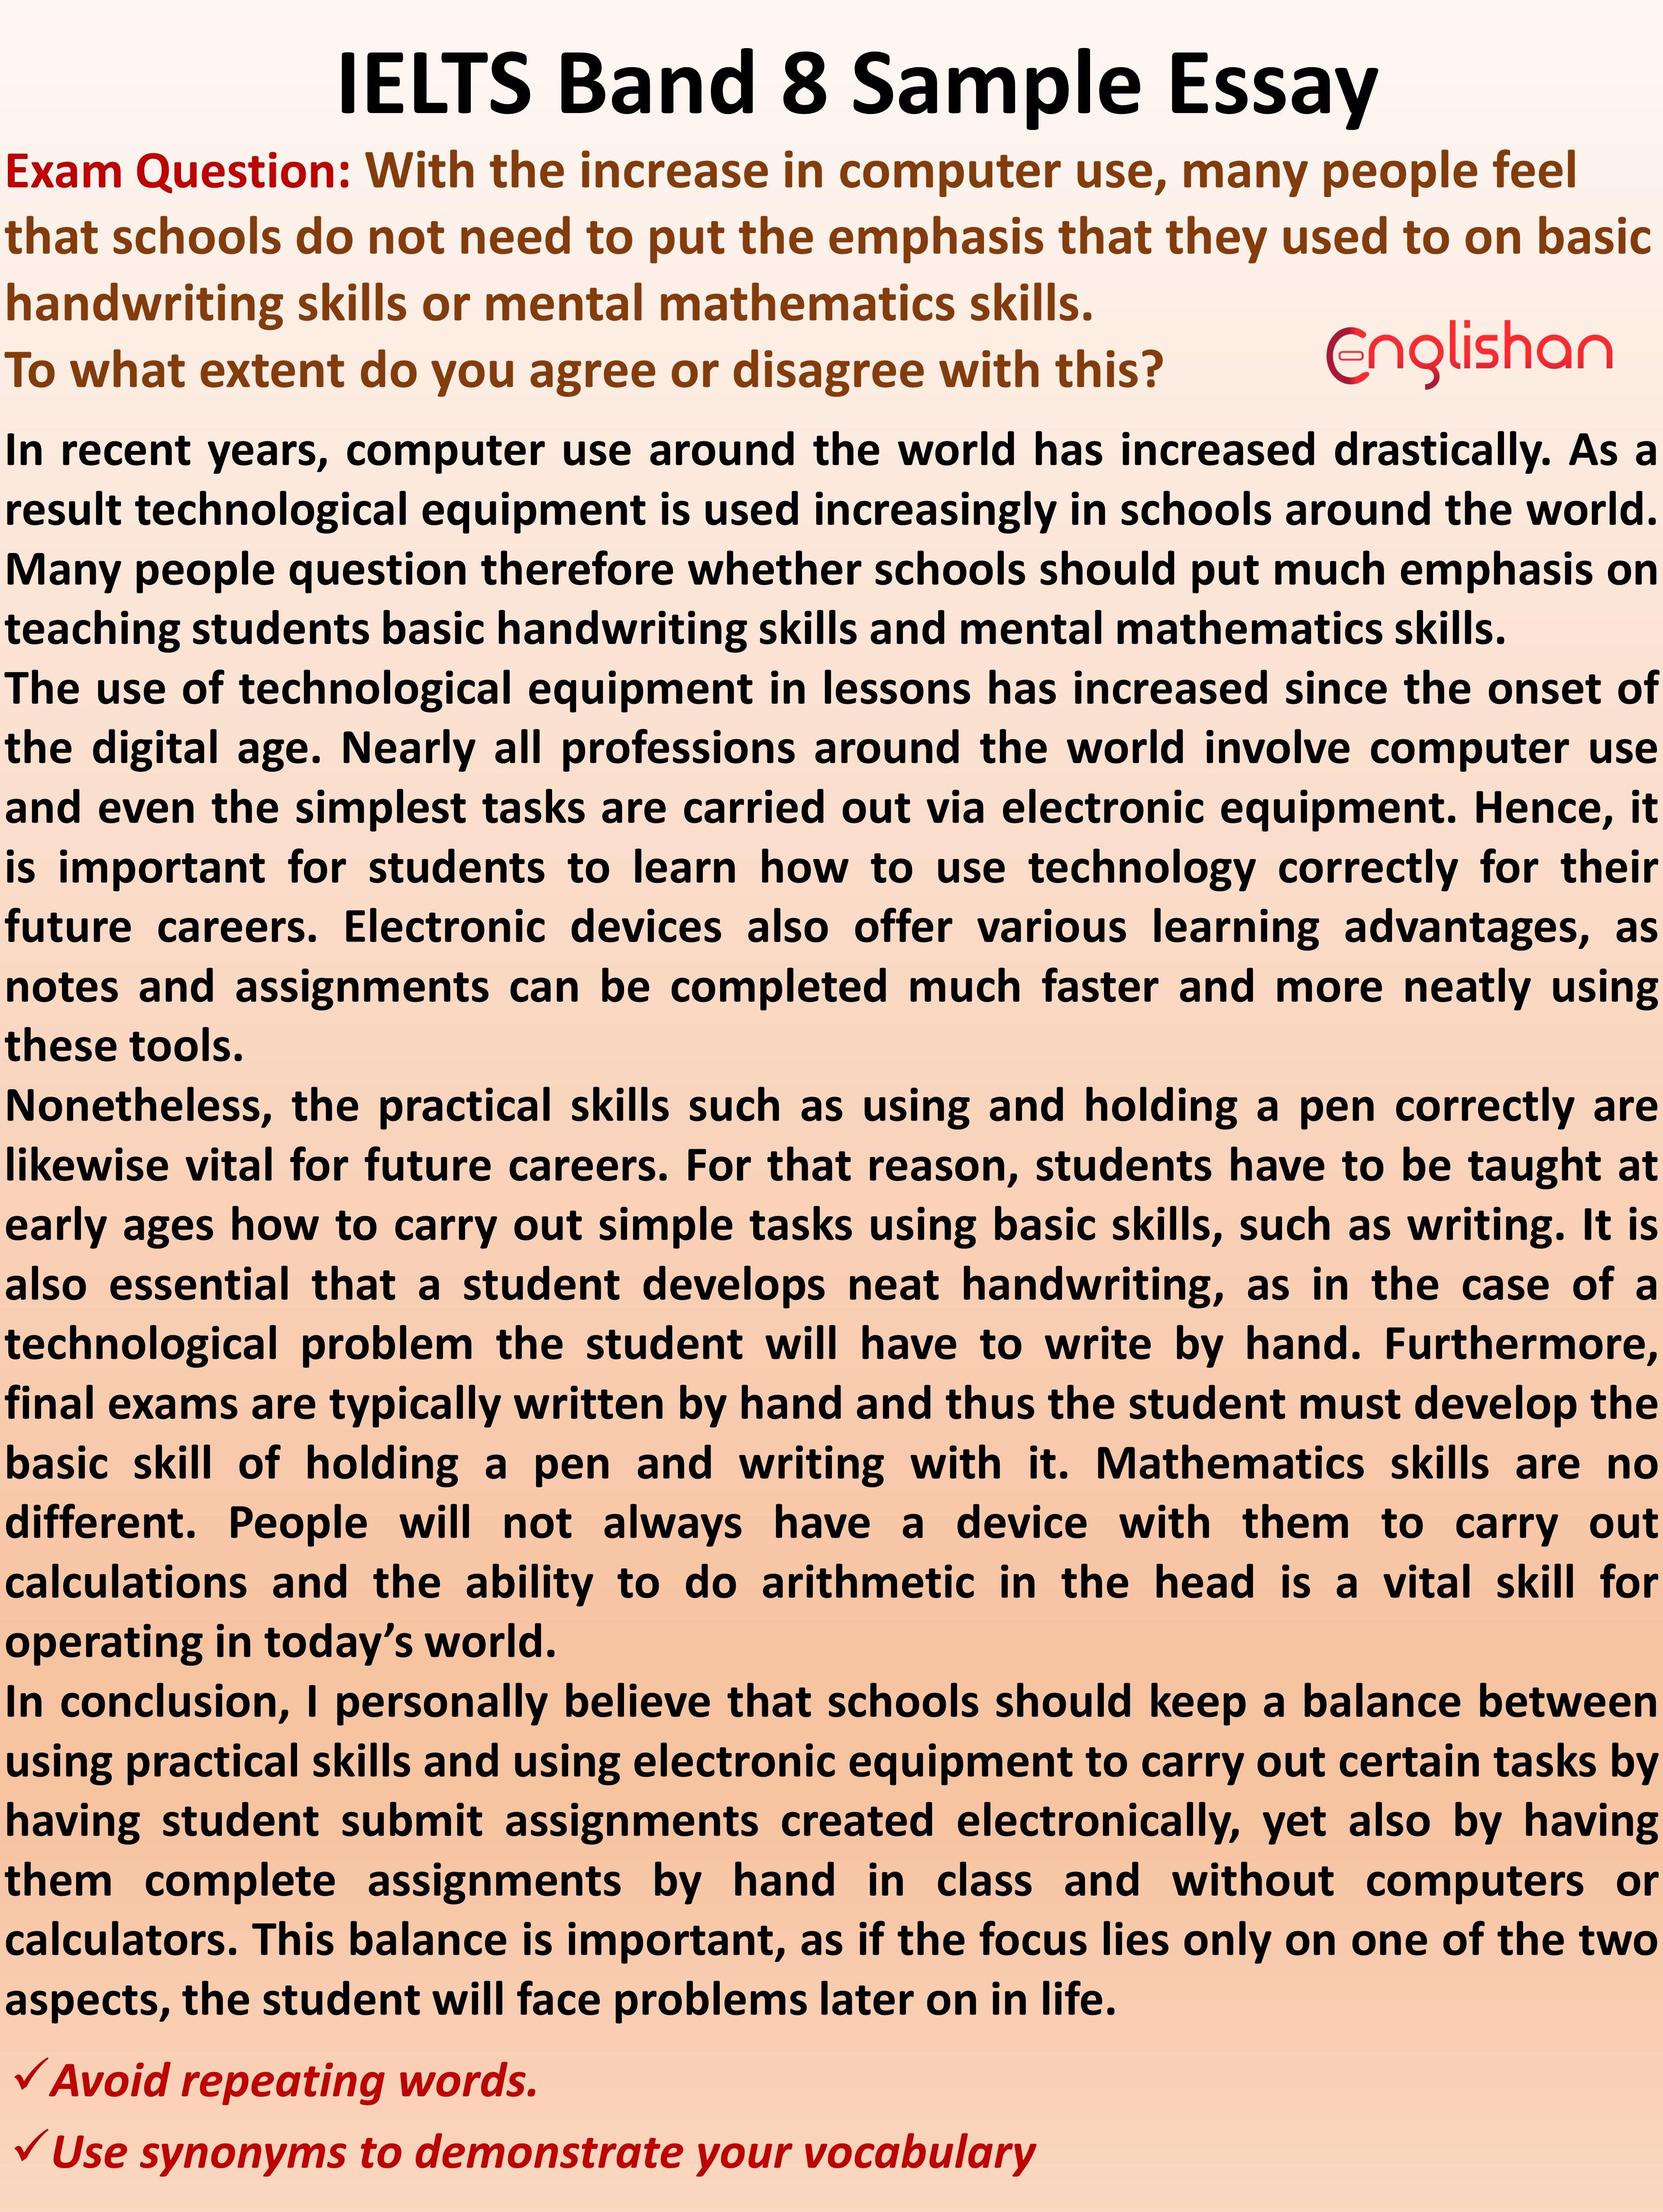 32 Ielts Essay Samples Band 8 Pdf Essay Writing Skills Persuasive Writing Examples Ielts